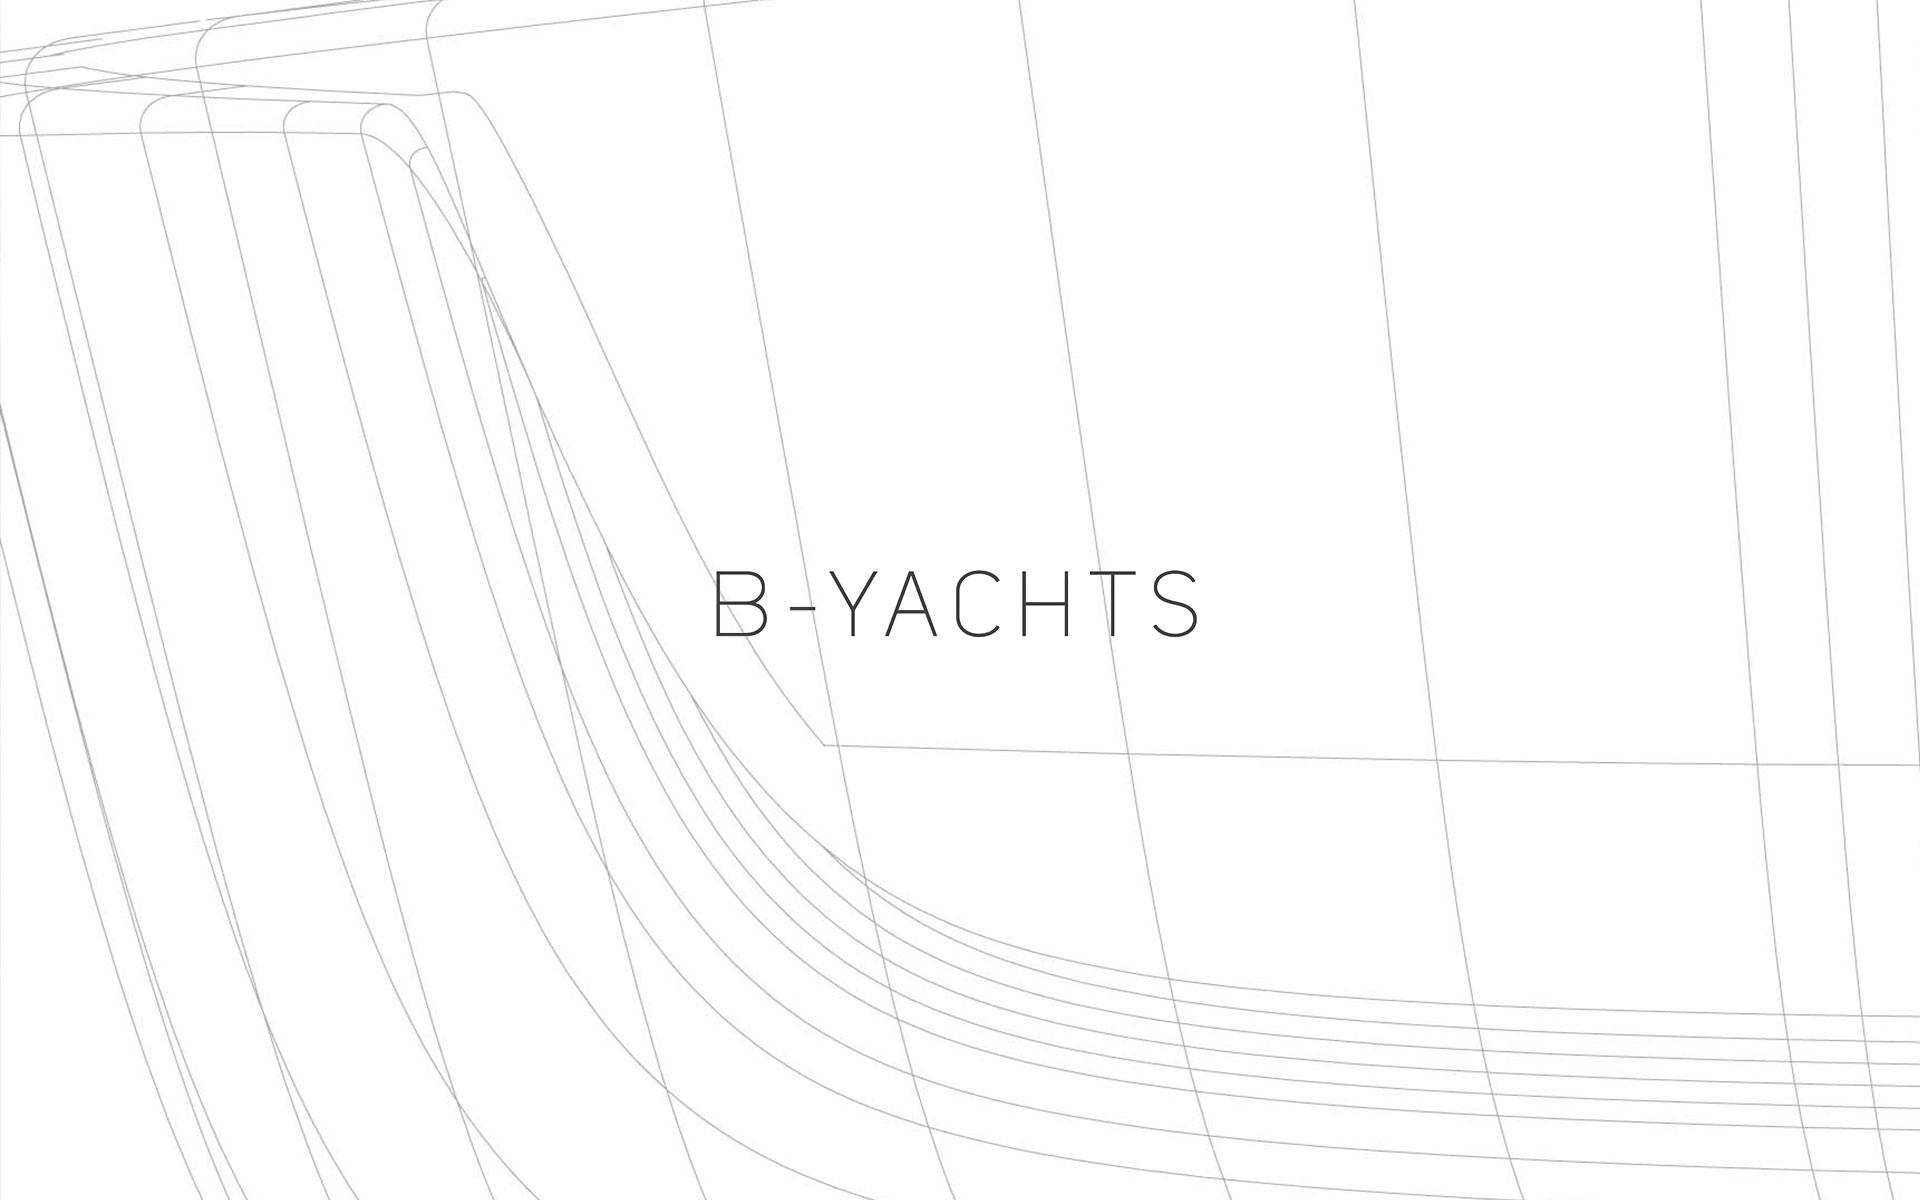 B-YACHTS